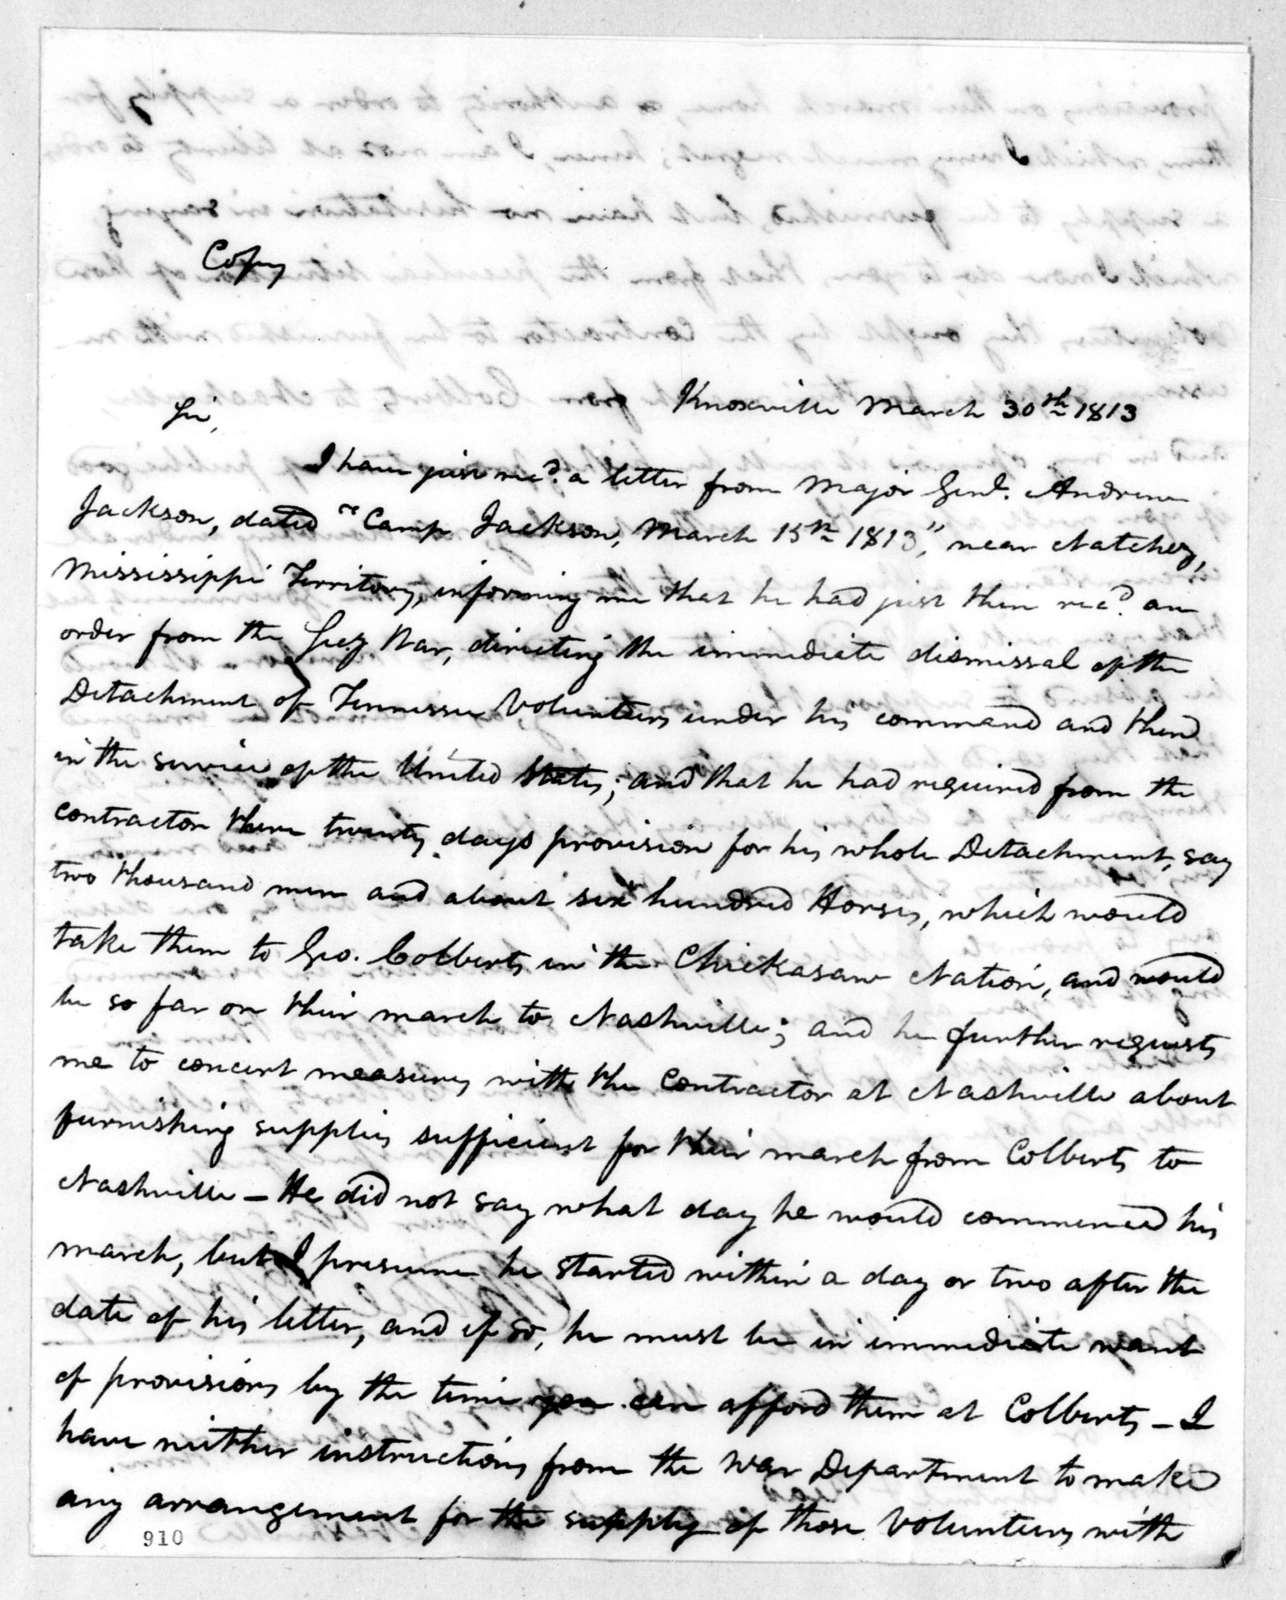 Willie Blount to James White, March 30, 1813